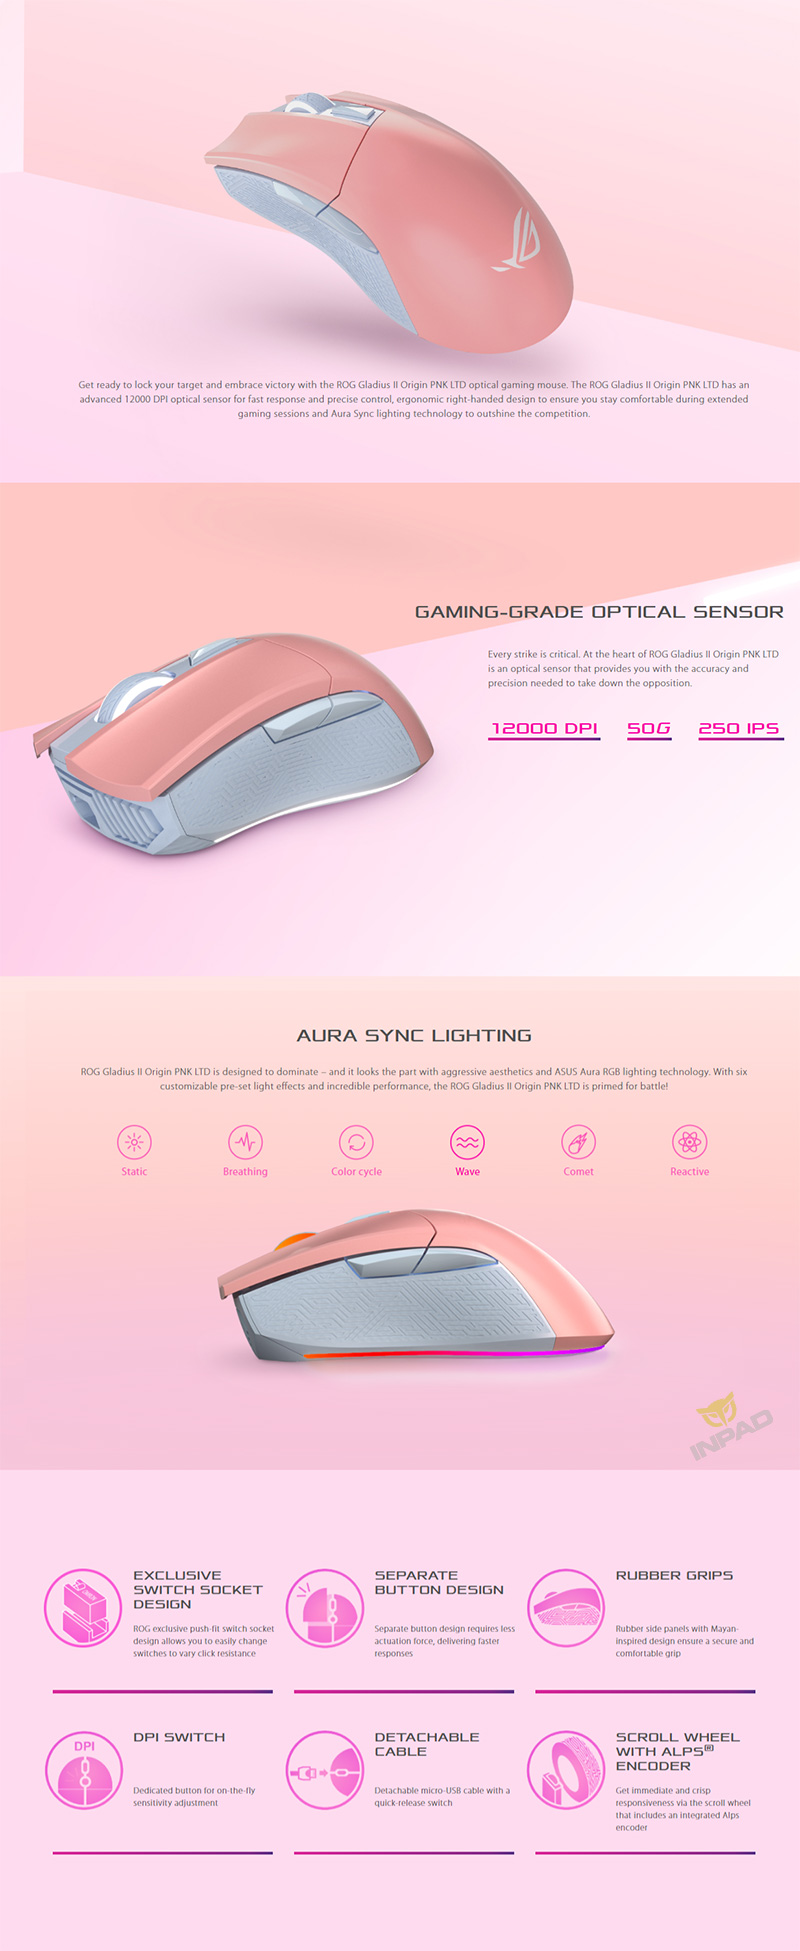 ASUS 華碩ROG GLADIUS II ORIGIN PNK神鬼戰士RGB光學滑鼠粉紅色_有線滑鼠_☆電競滑鼠_滑鼠|鼠墊|滑鼠周邊|